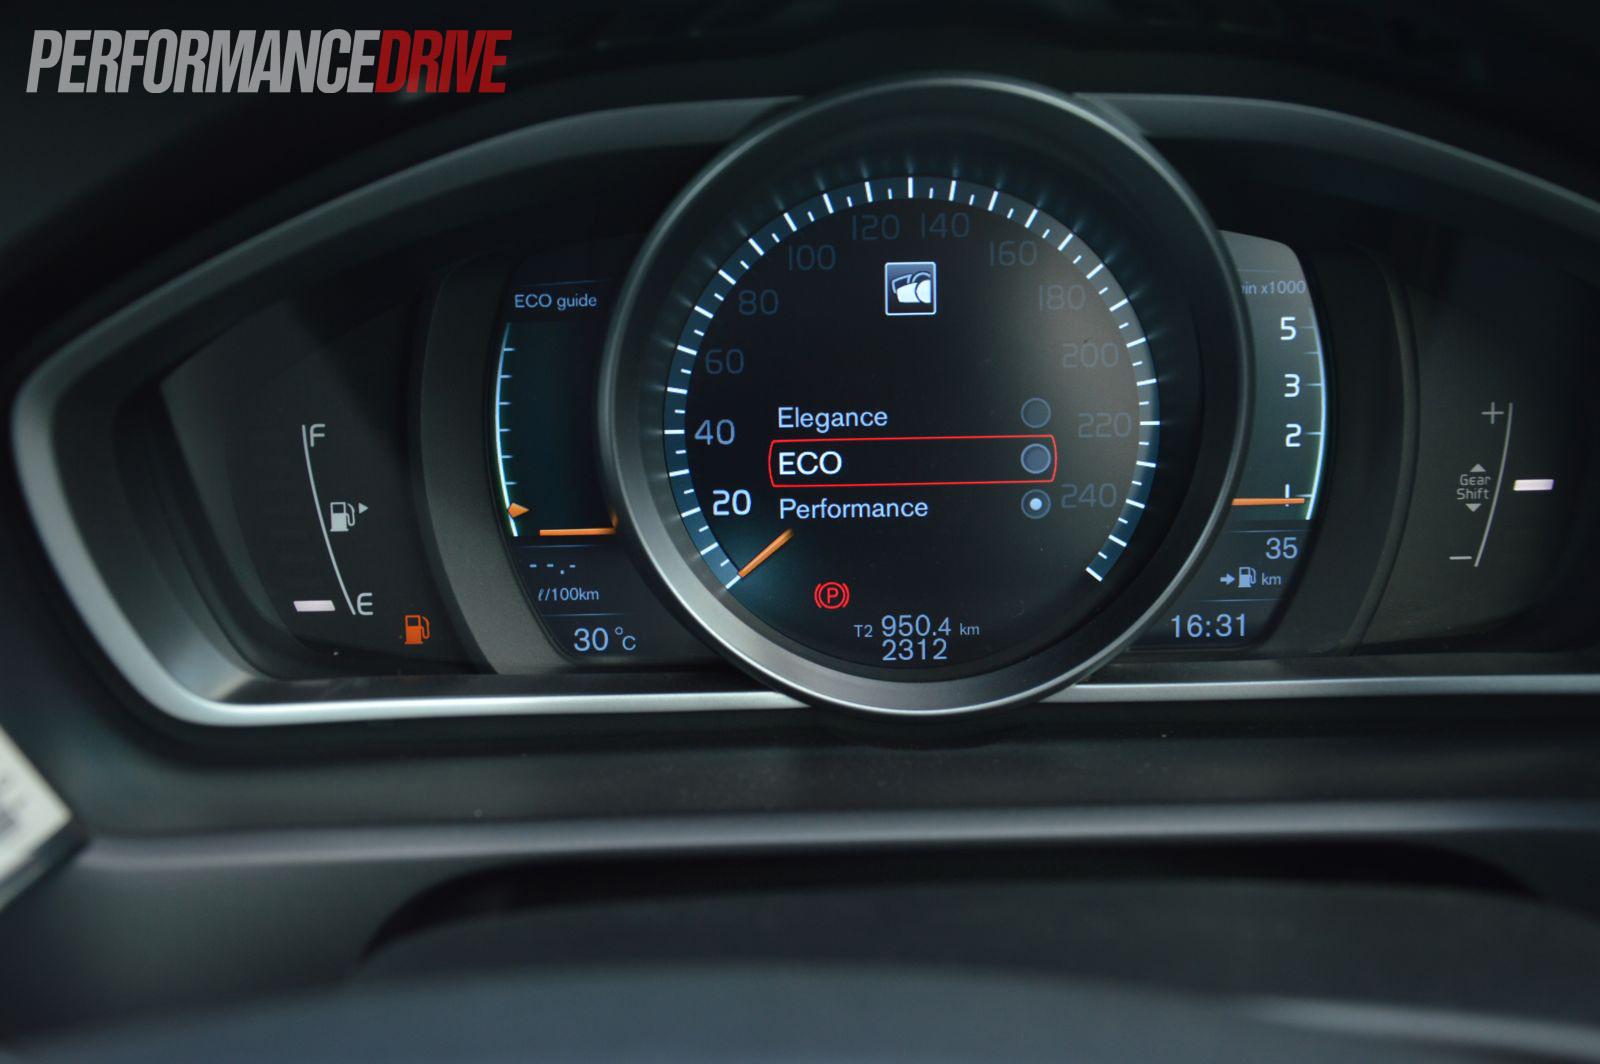 Nissan Suv For Sale >> 2013 Volvo V40 D4 TFT crystal display themes